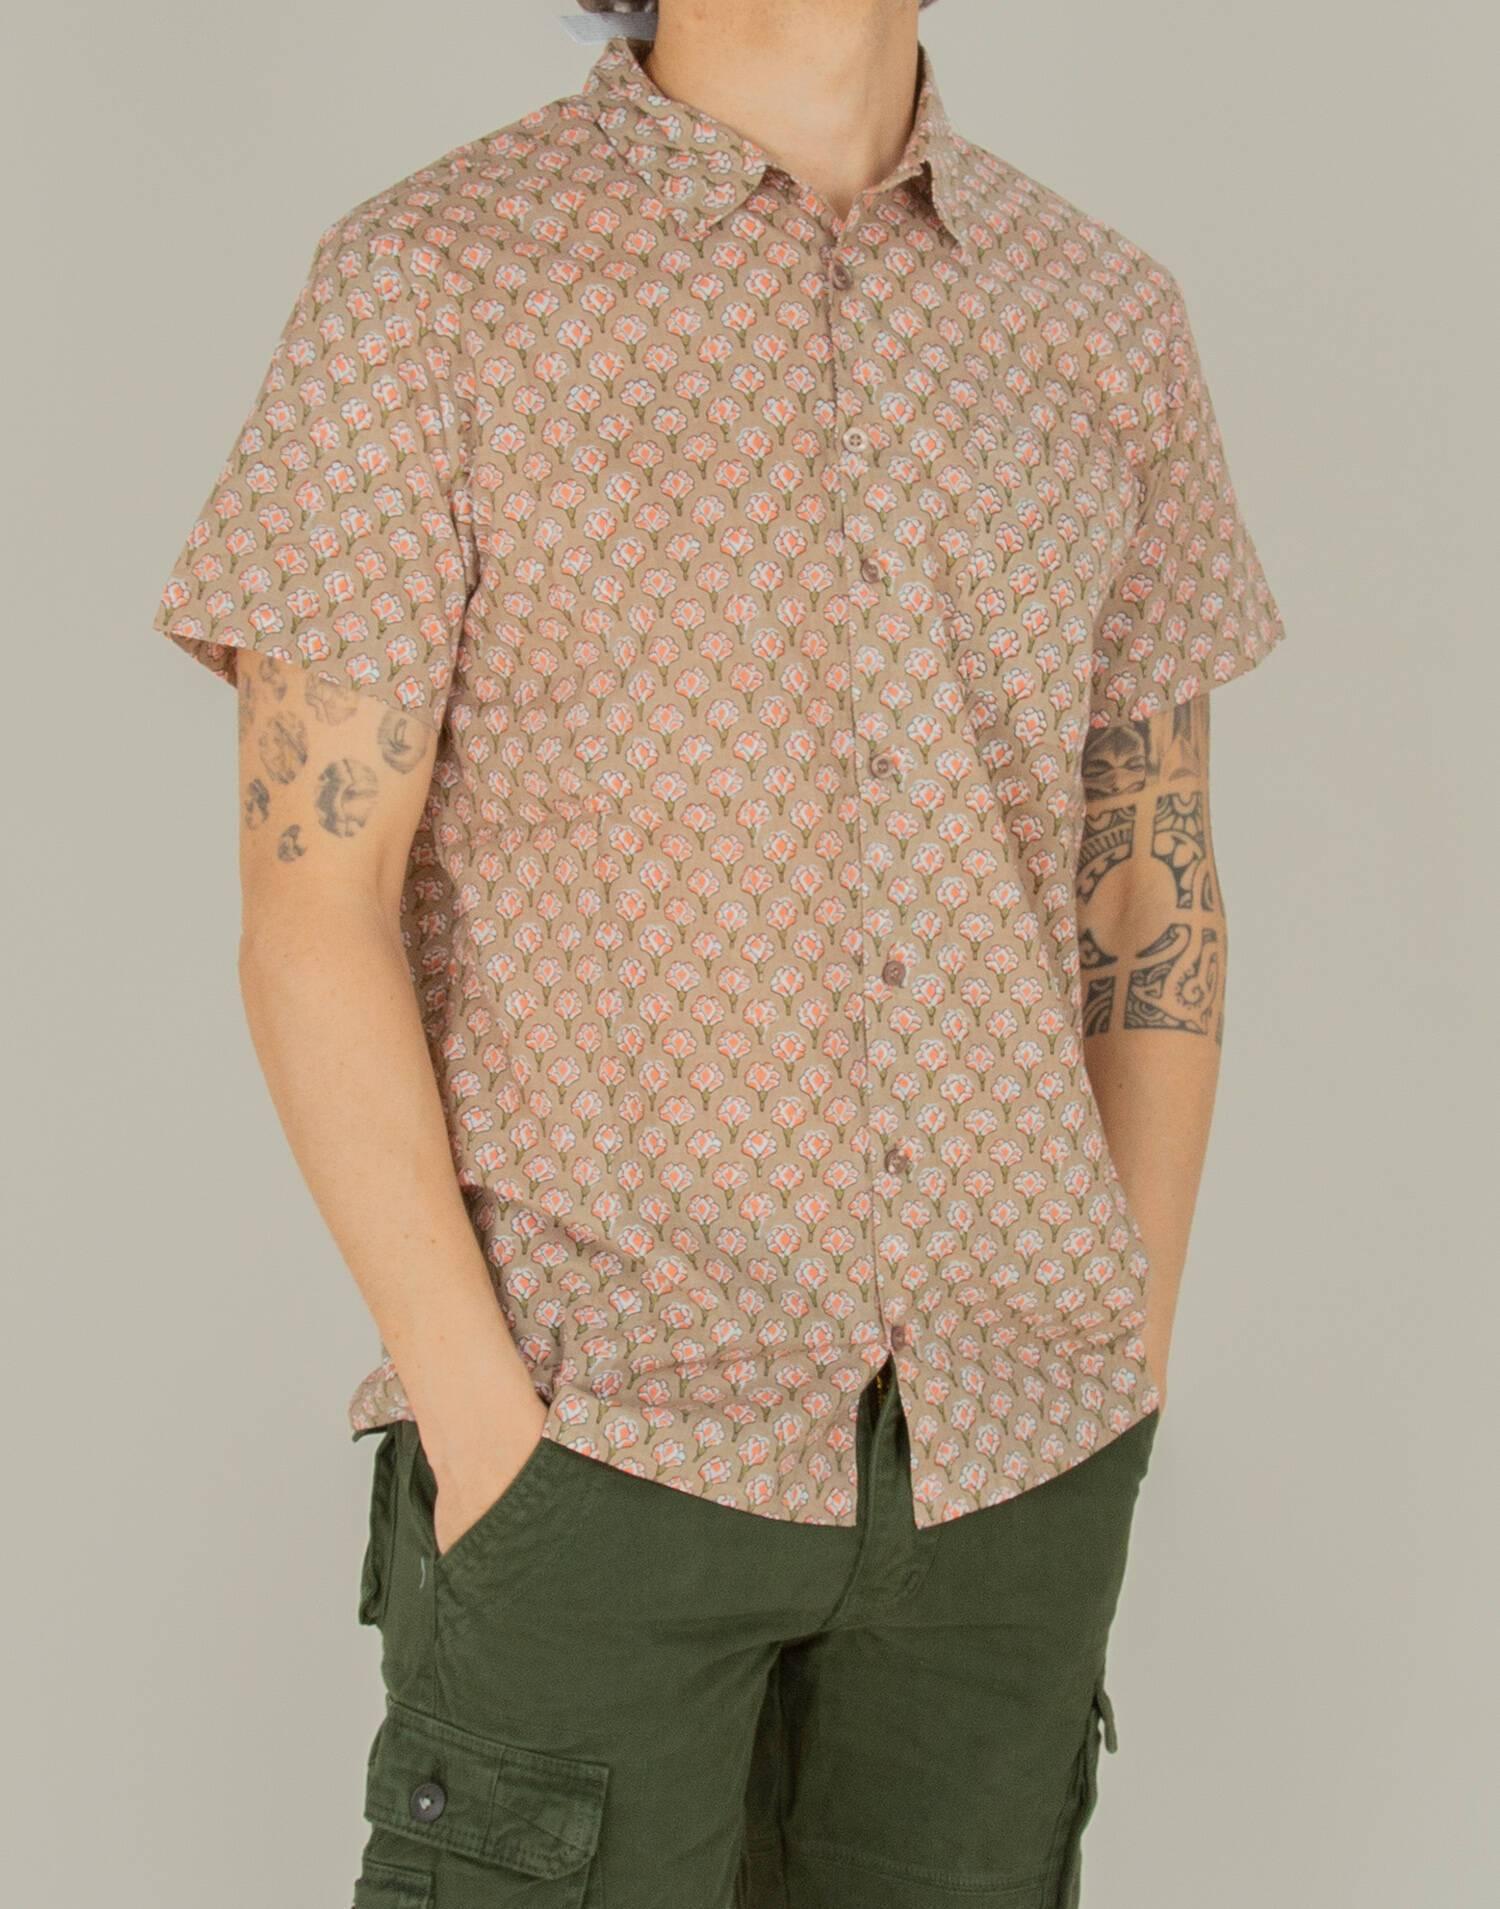 Camisa sello indio hombre